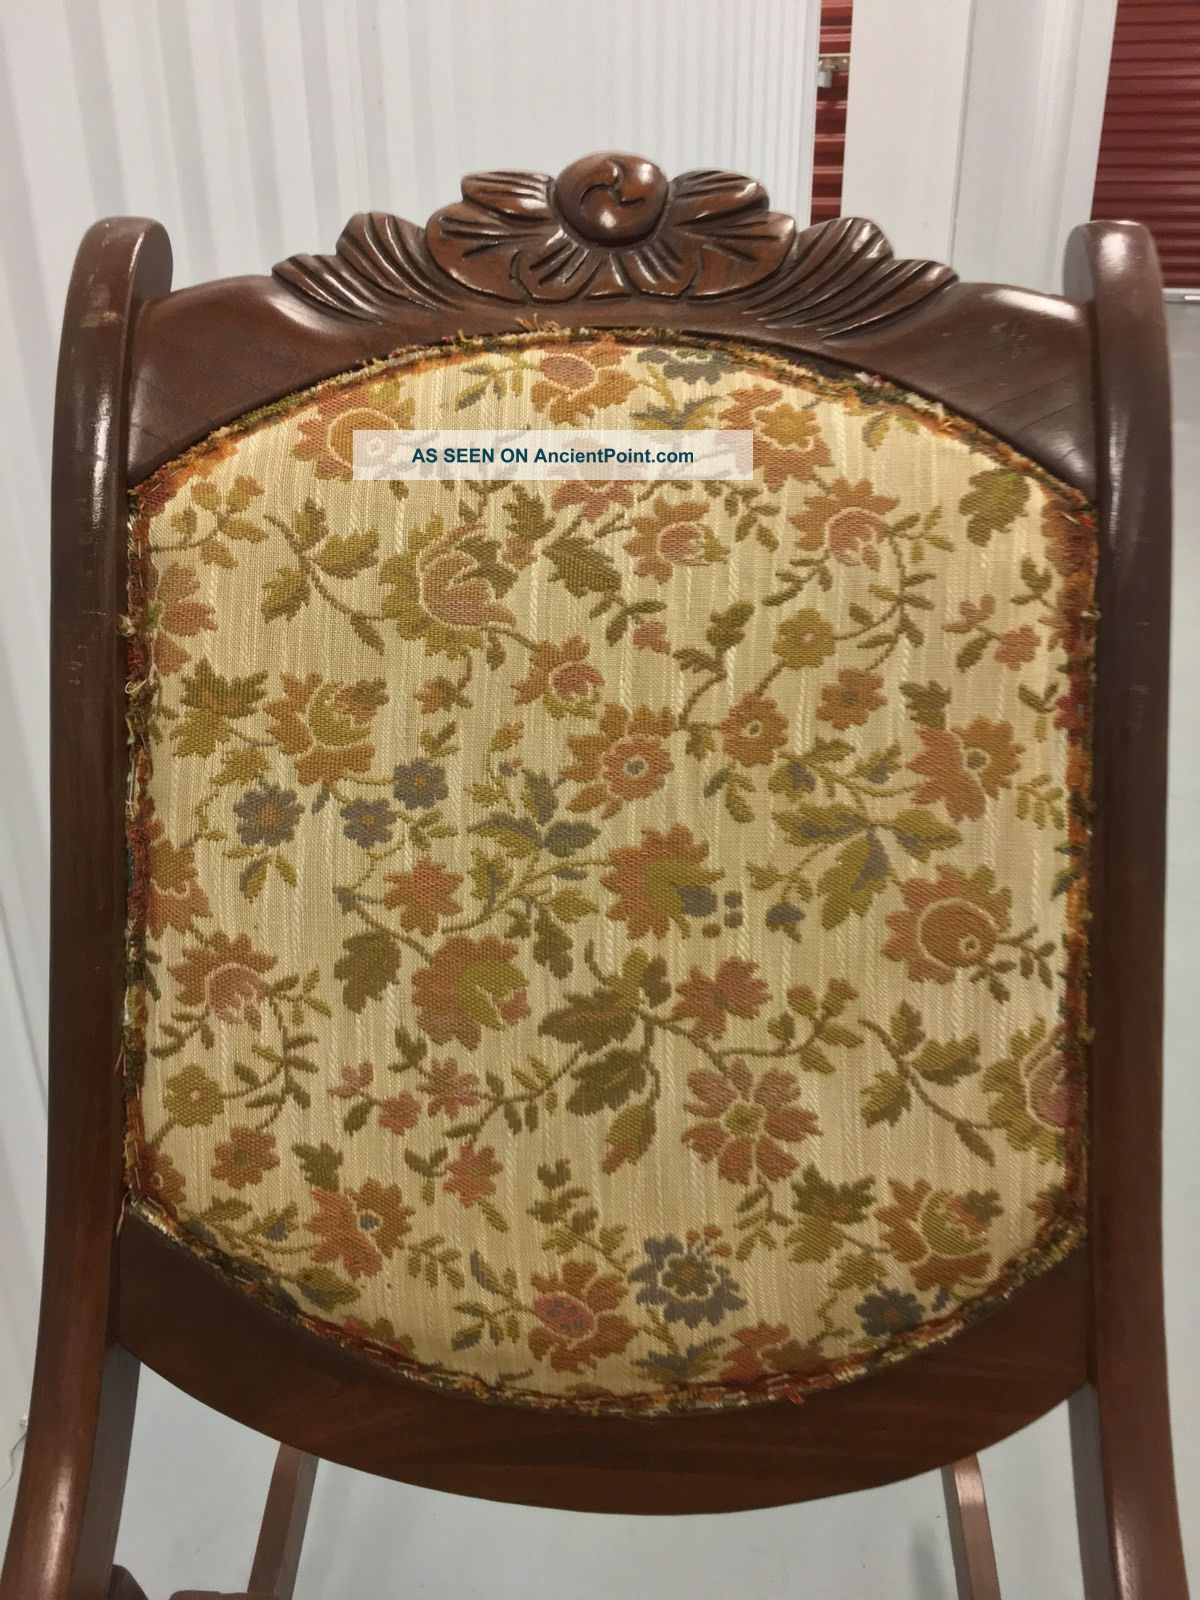 Antique Vintage Wooden Folding Rocker Rocking Chair